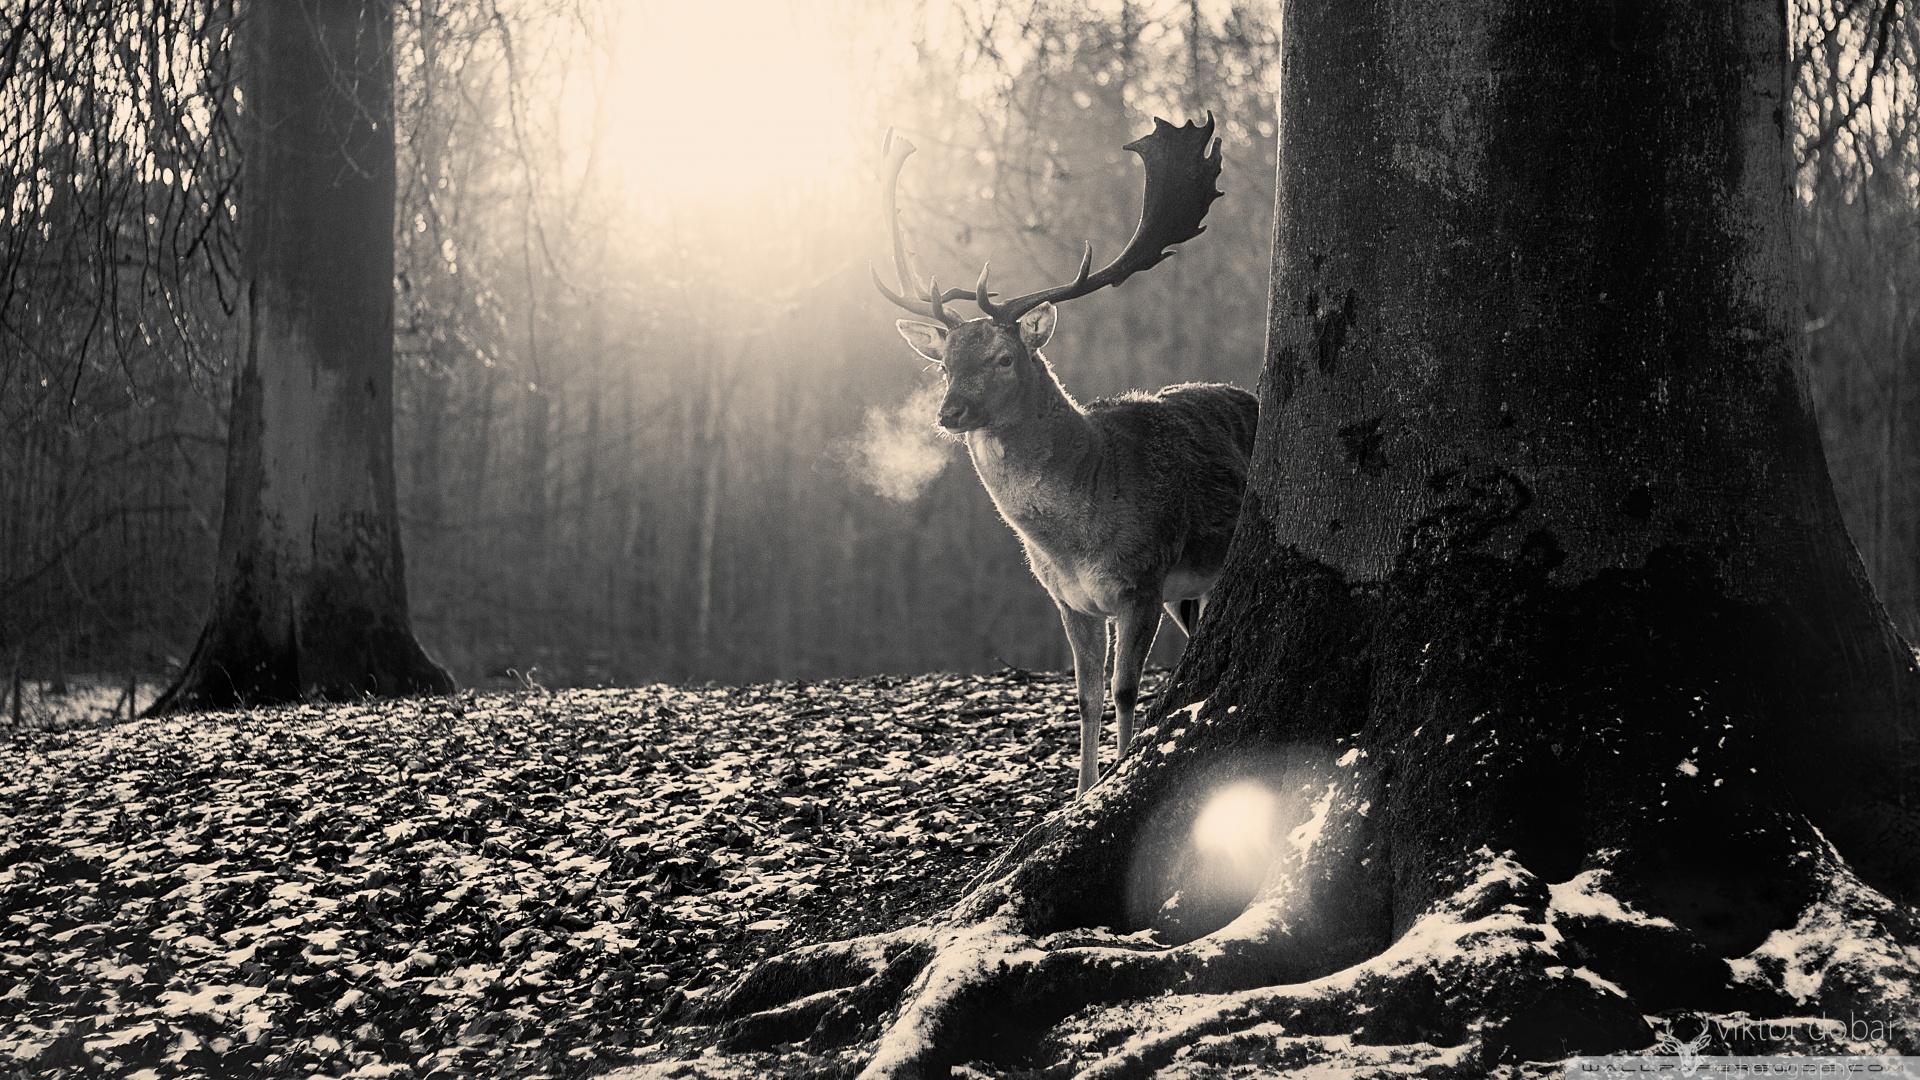 stag_winter-wallpaper-1920x1080